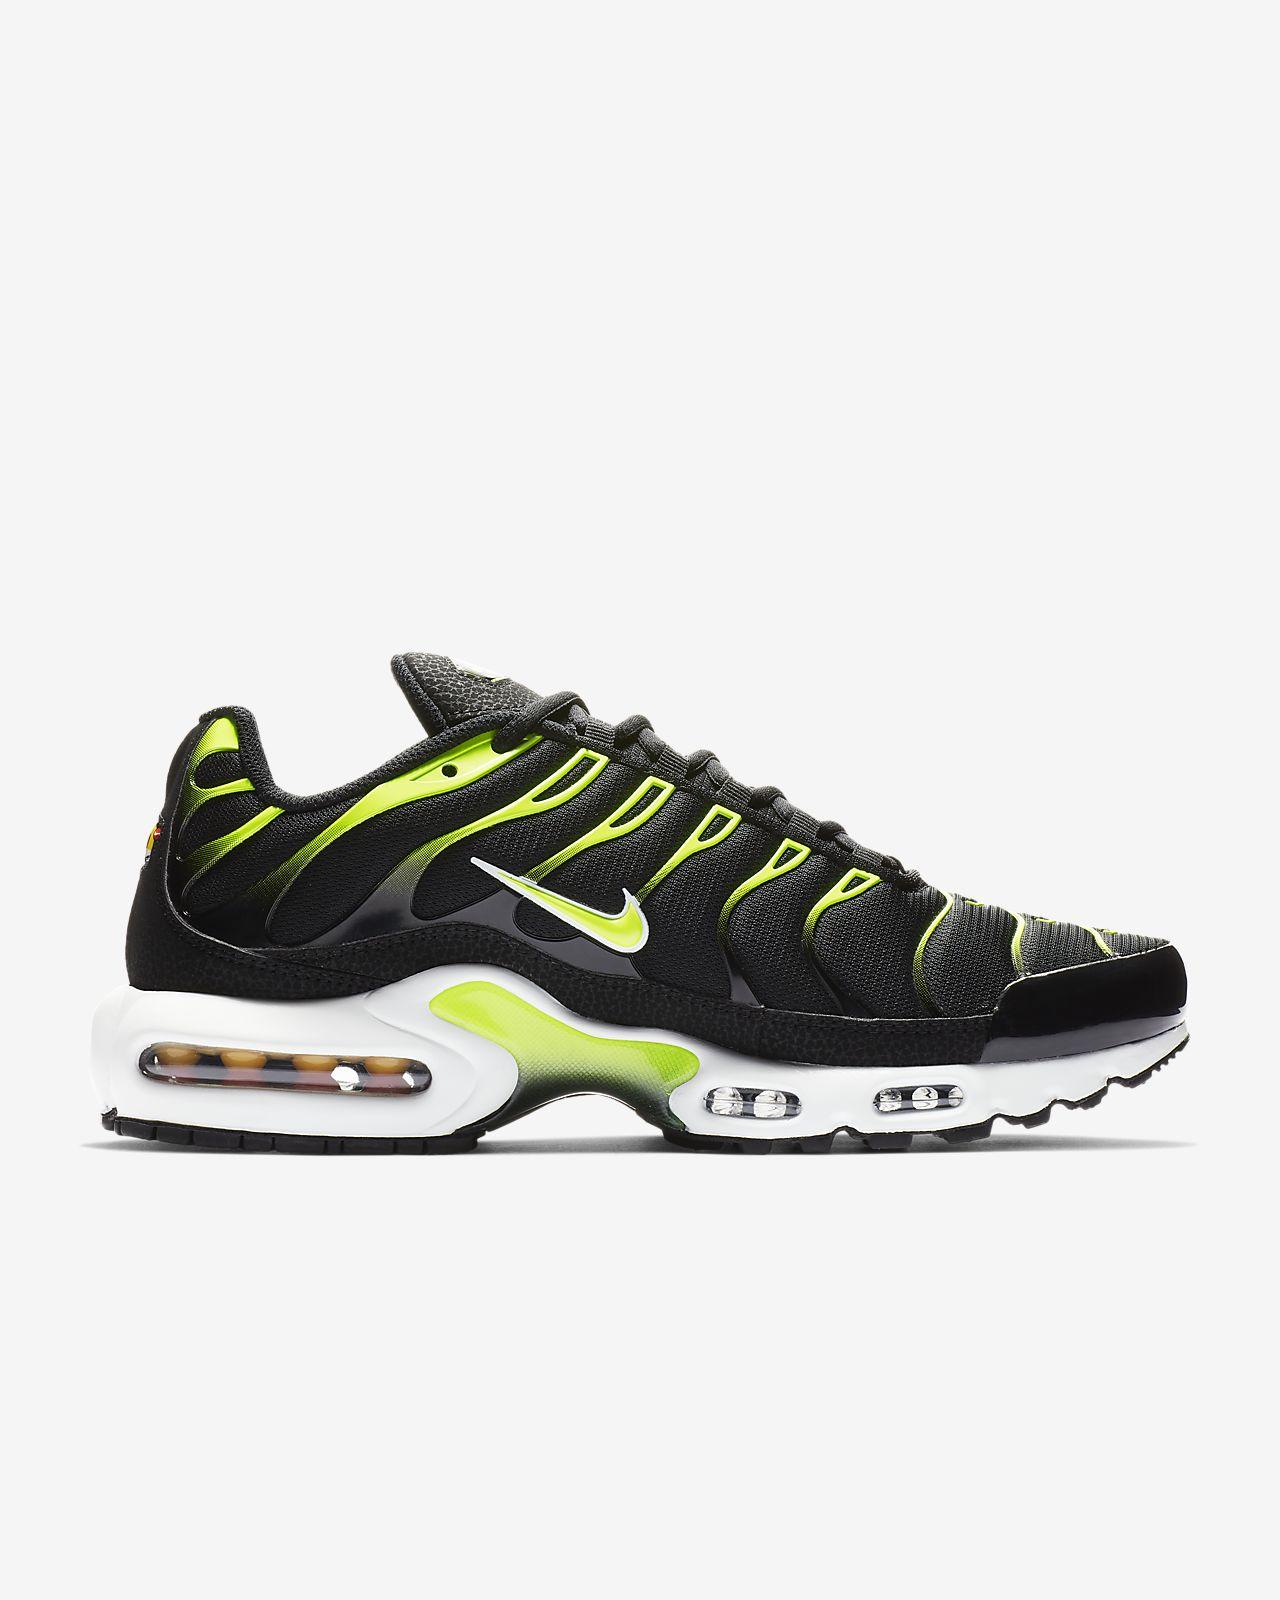 premium selection 83687 ffe37 ... Sko Nike Air Max Plus för män